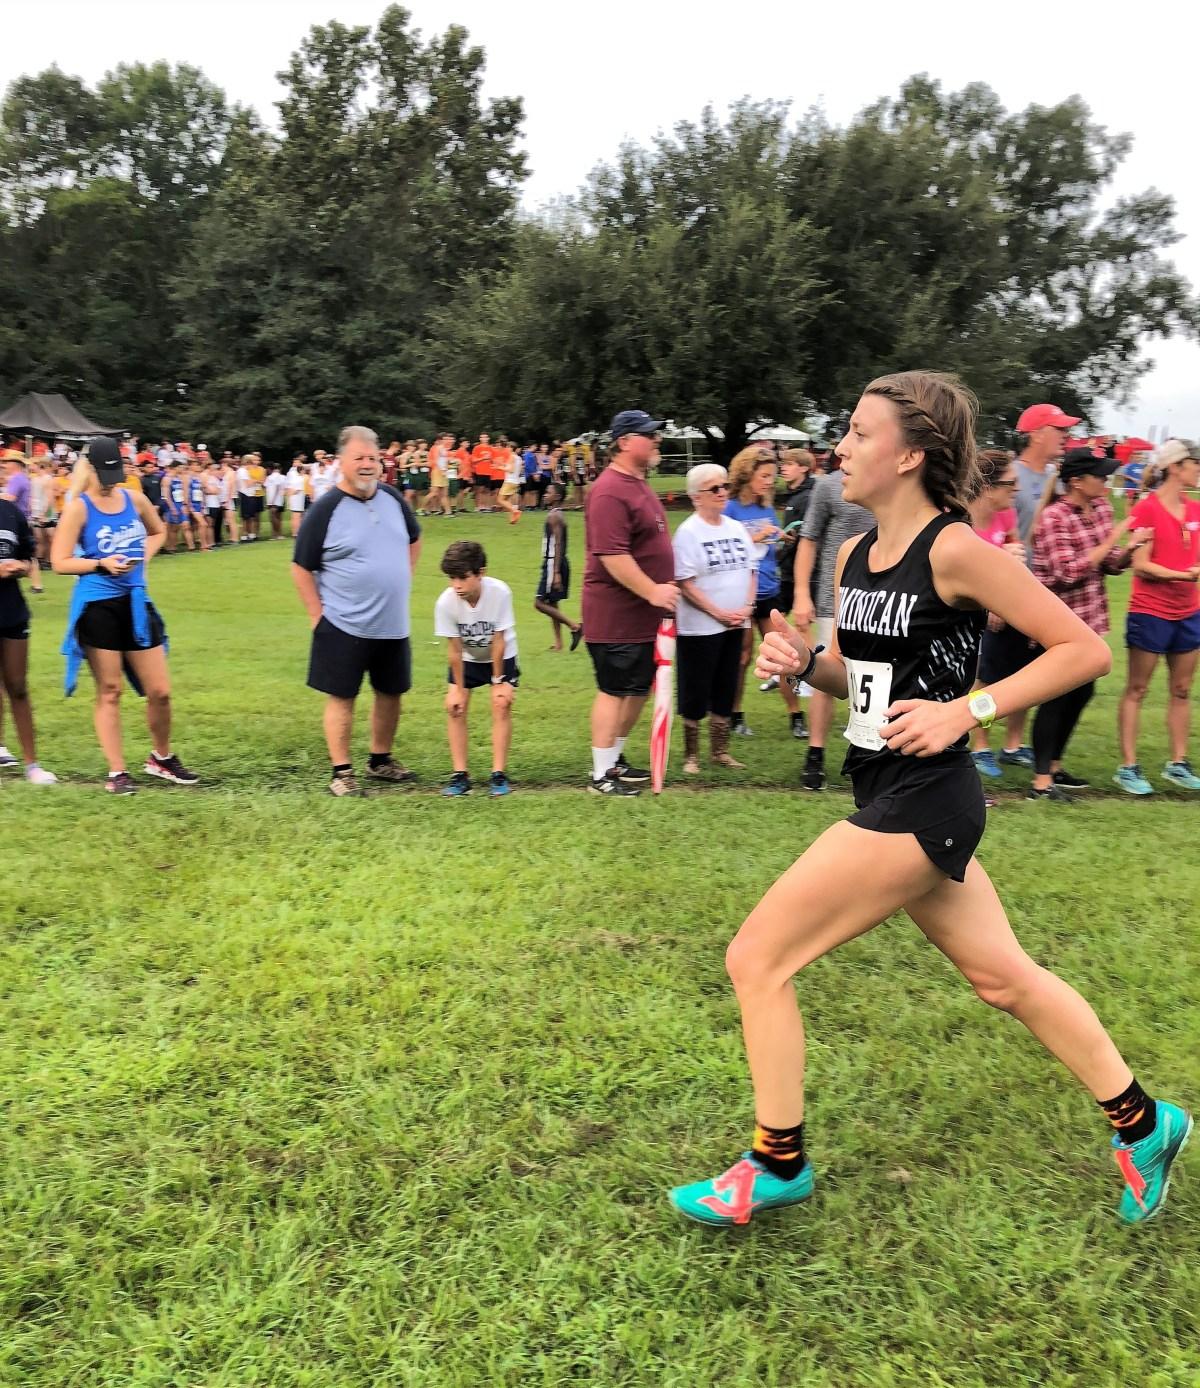 Lizzy Running